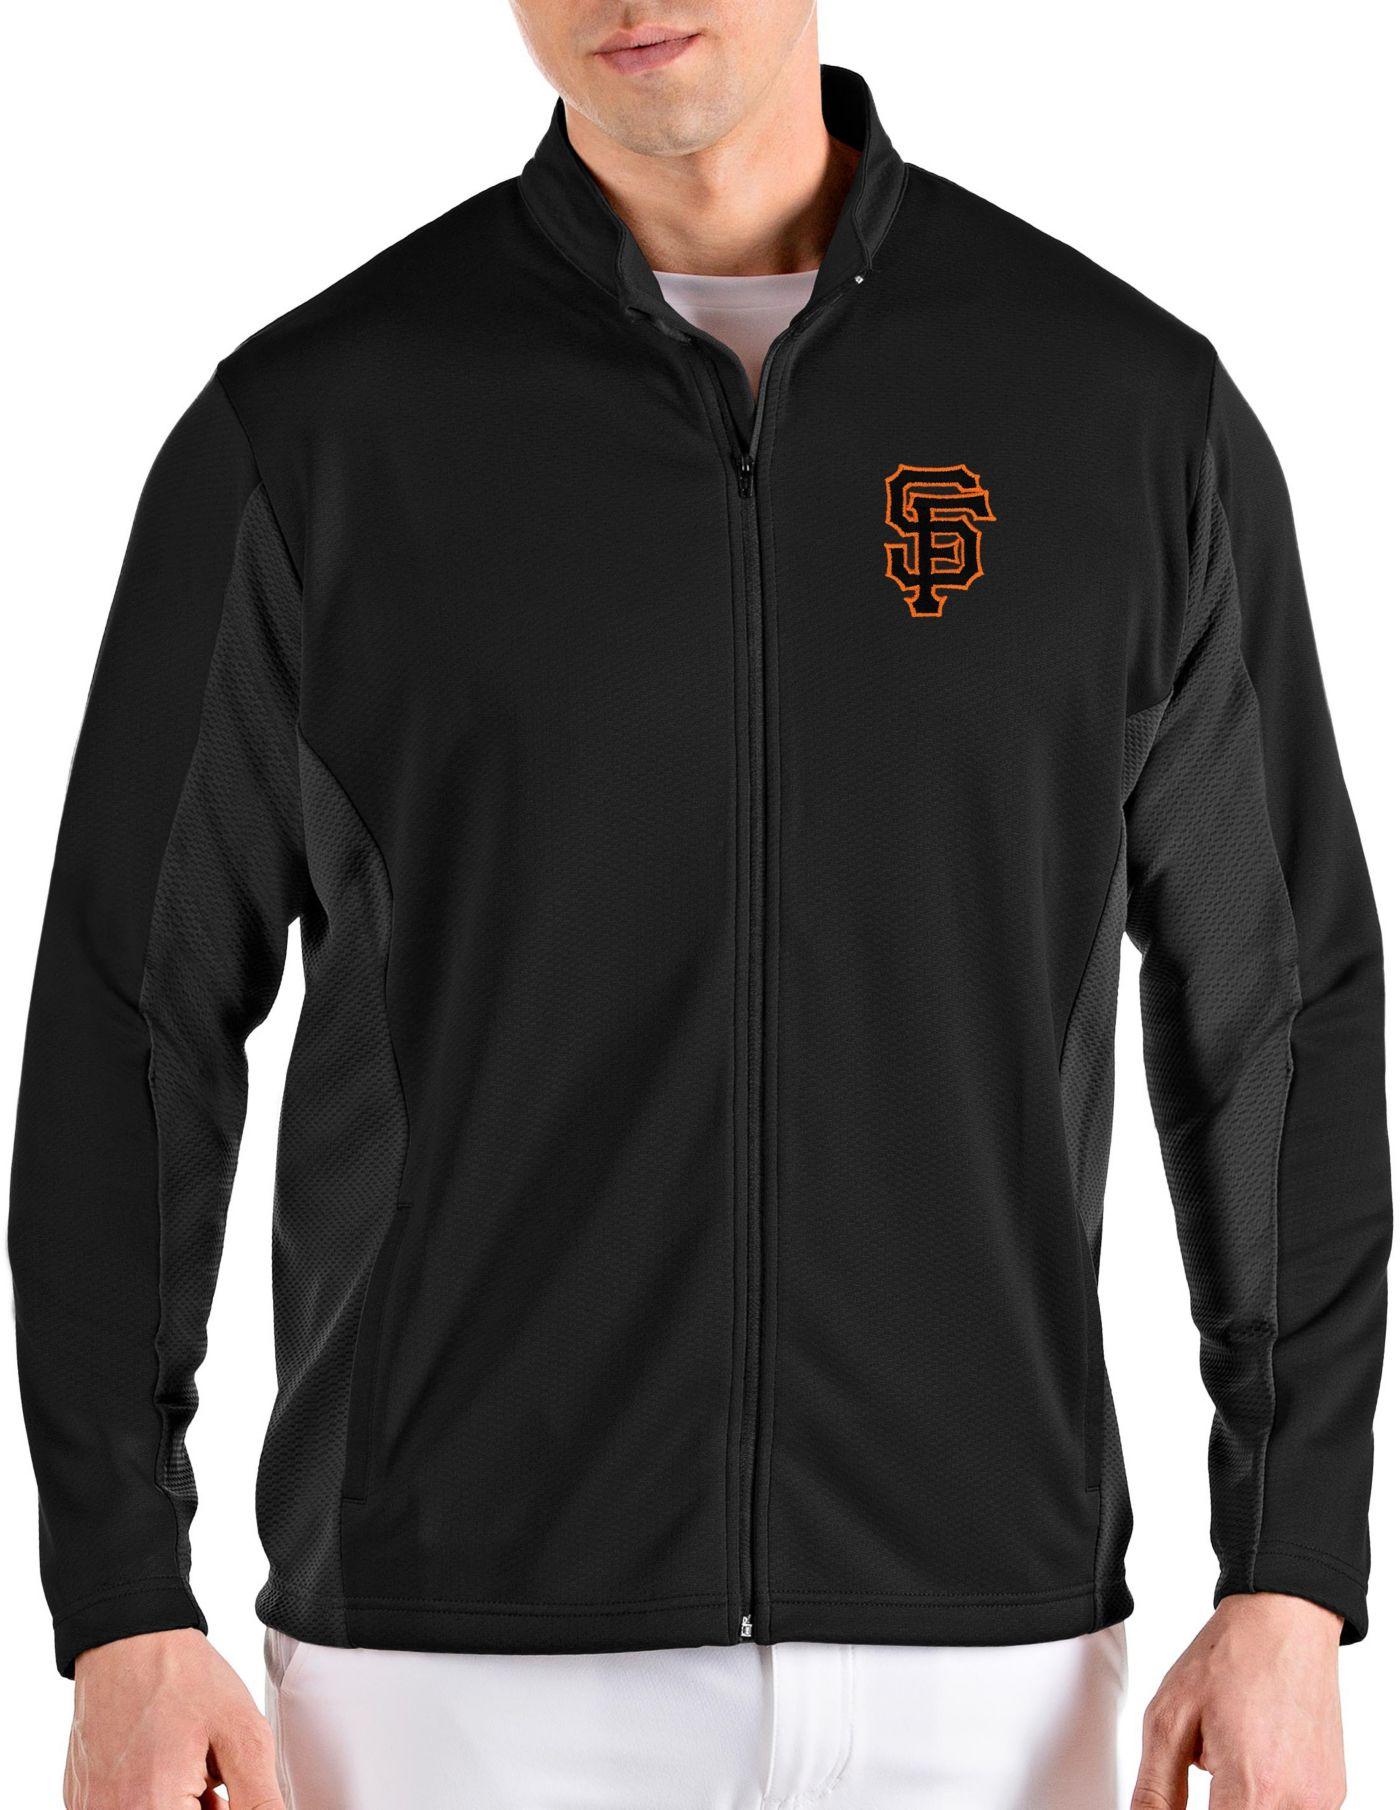 Antigua Men's San Francisco Giants Black Passage Full-Zip Jacket